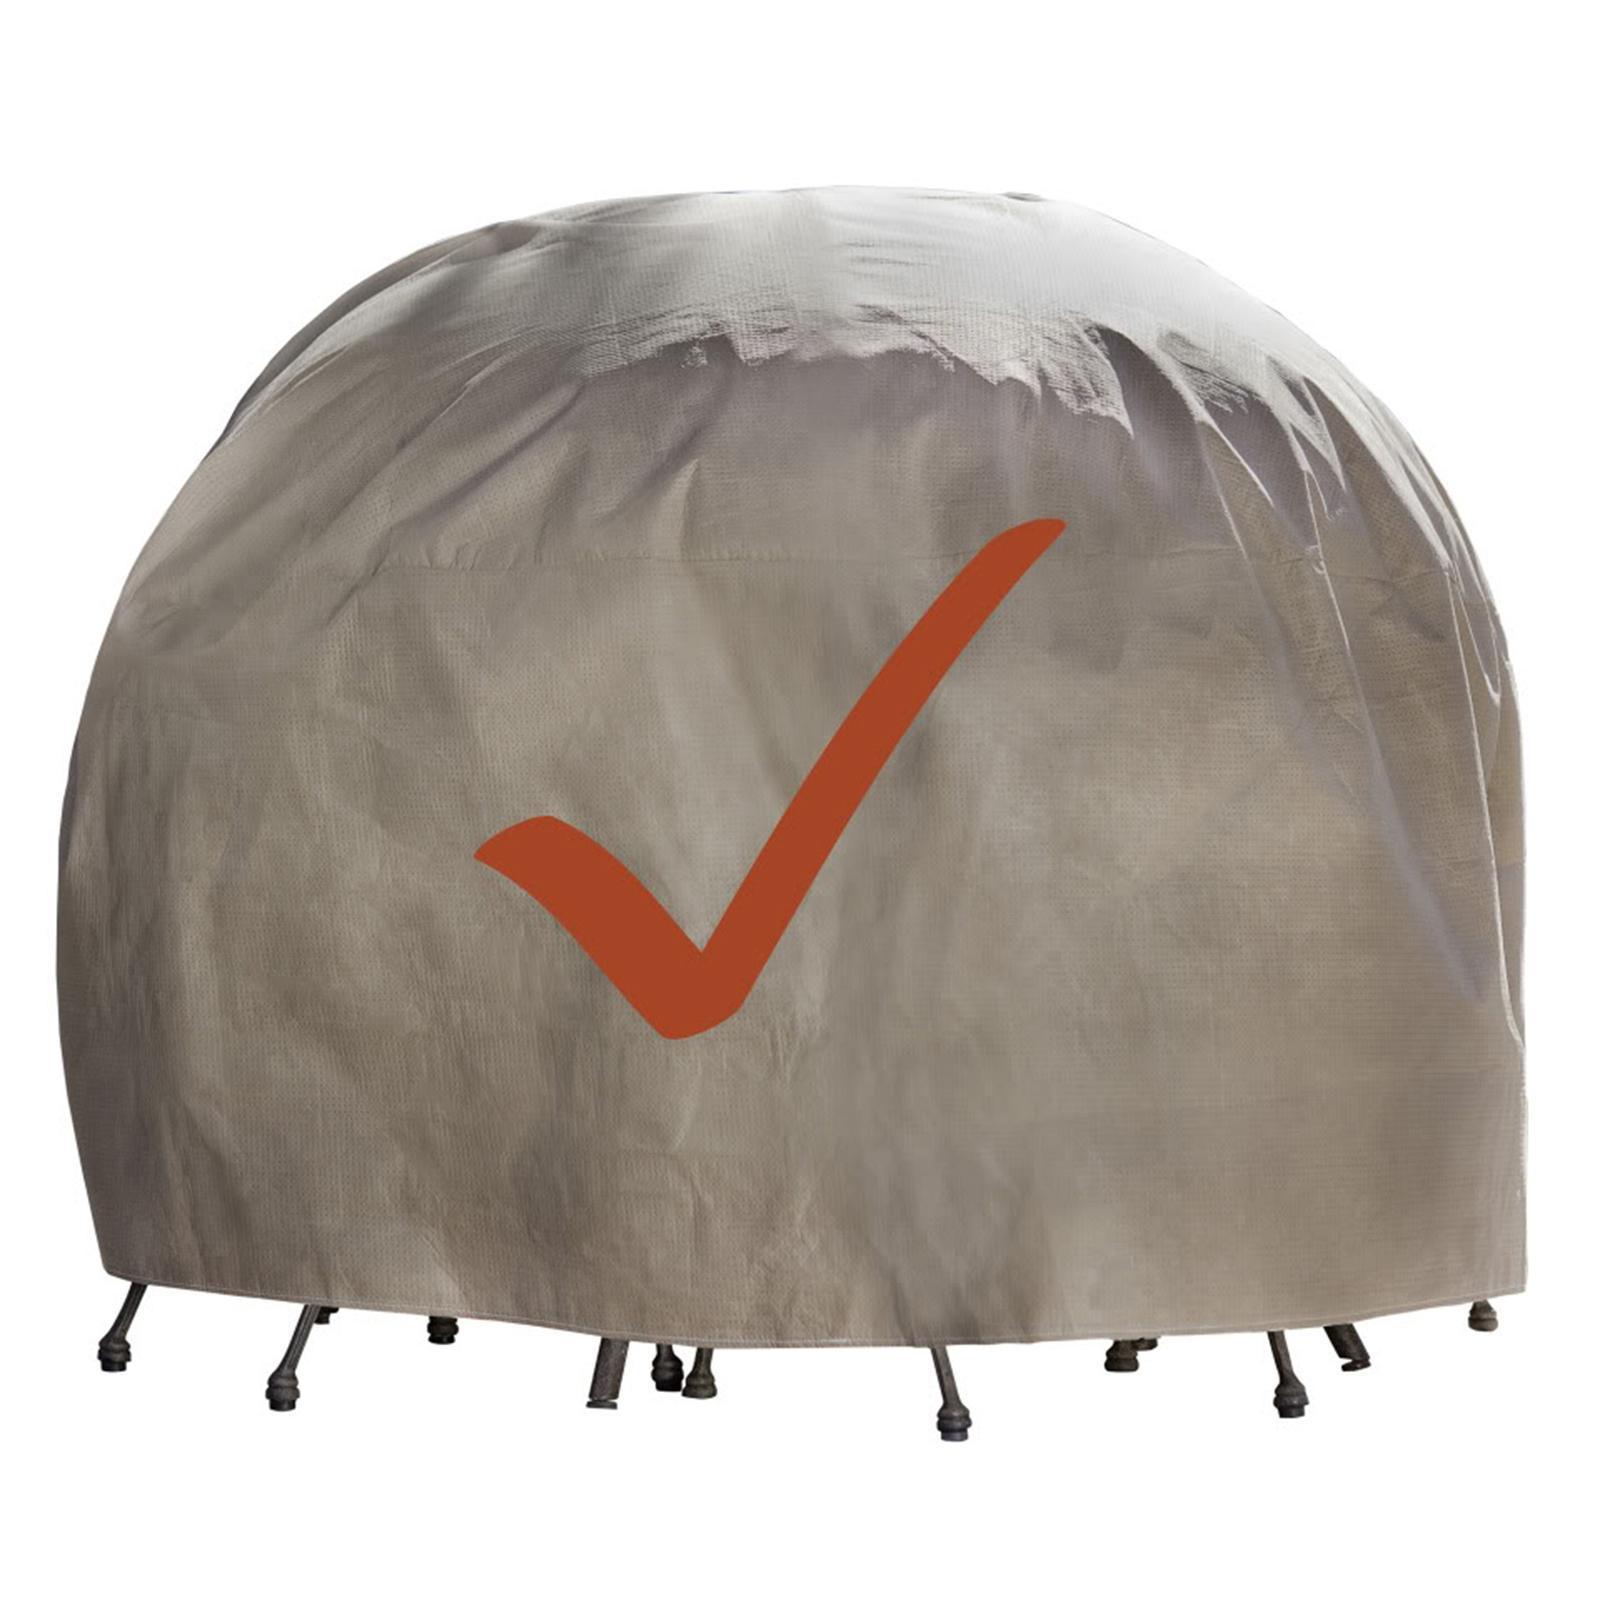 Amazon.com: Pato Covers ht198 Bomba de aire recargable para ...